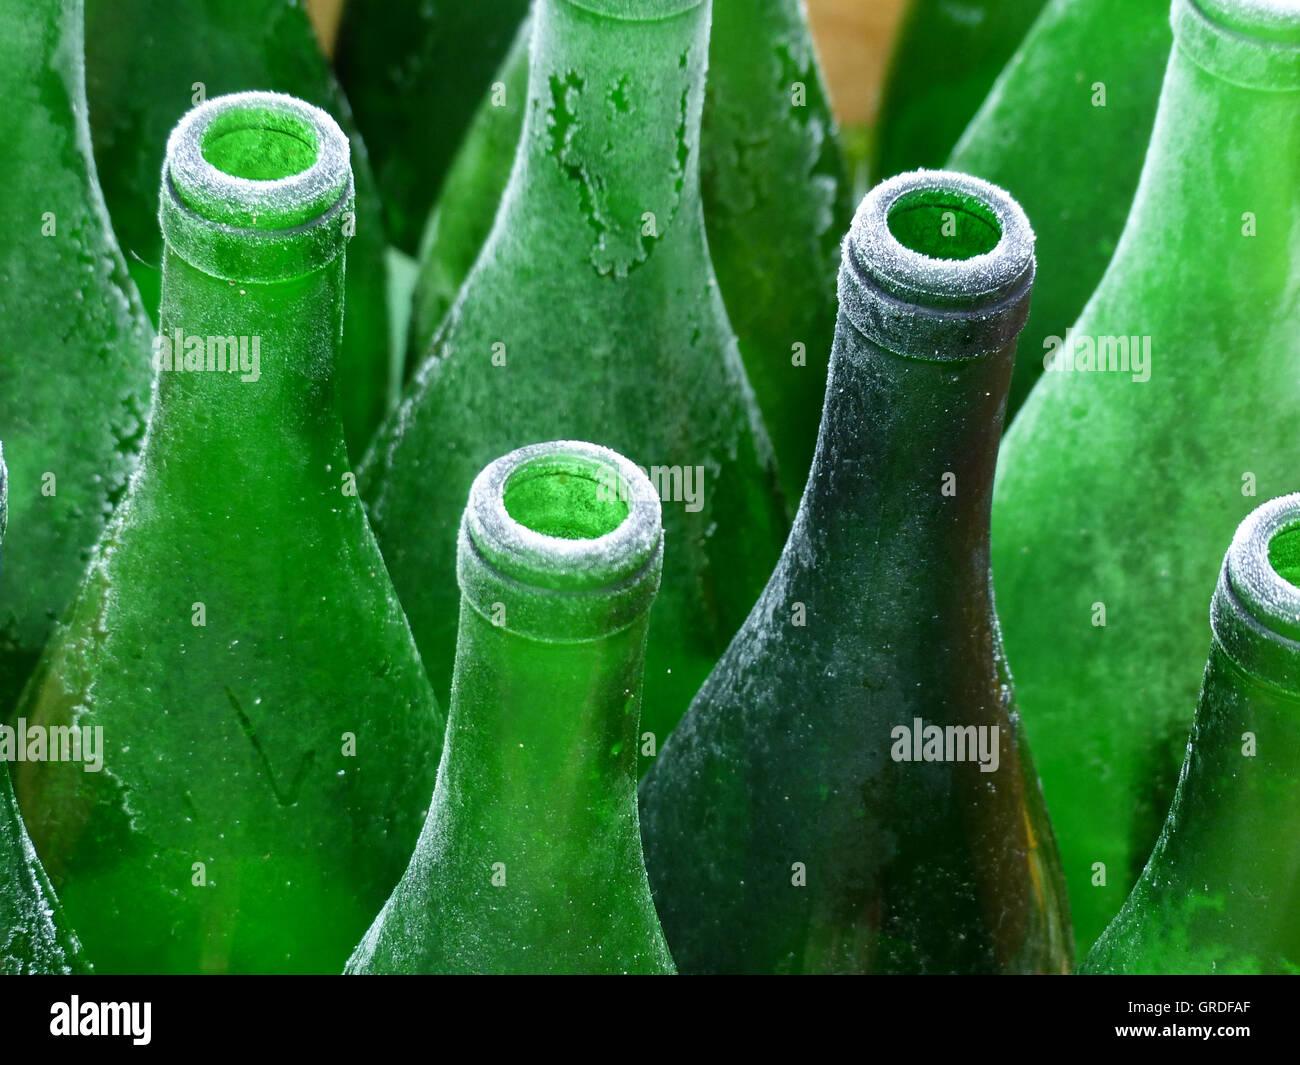 Green Wine Bottles Stock Photos & Green Wine Bottles Stock Images ...